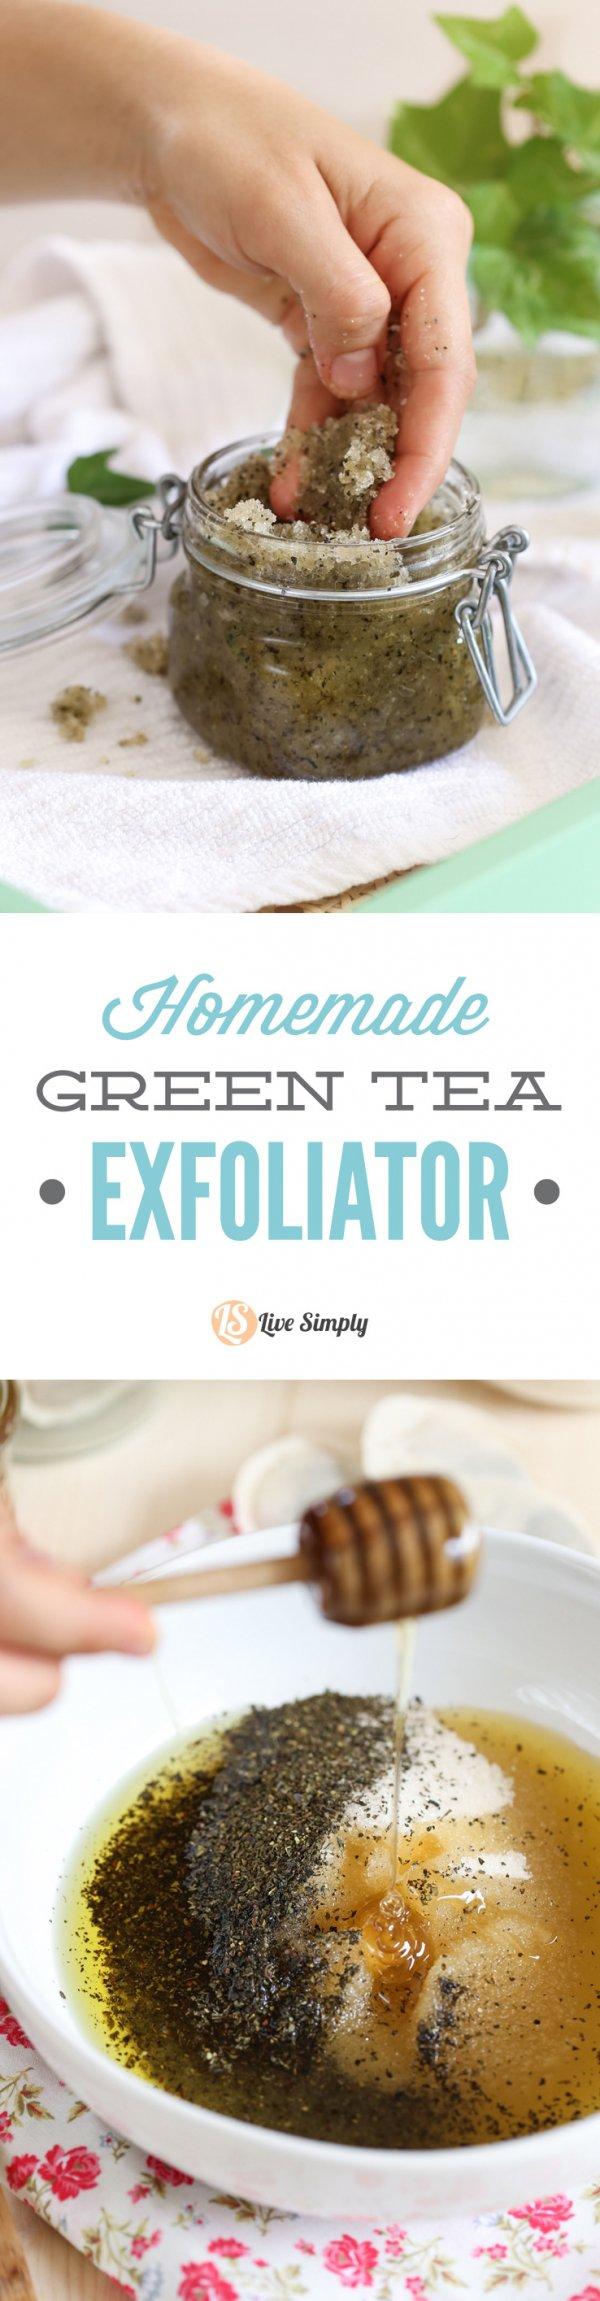 A Green Tea Scrub with a Creative Twist? Count Me in!